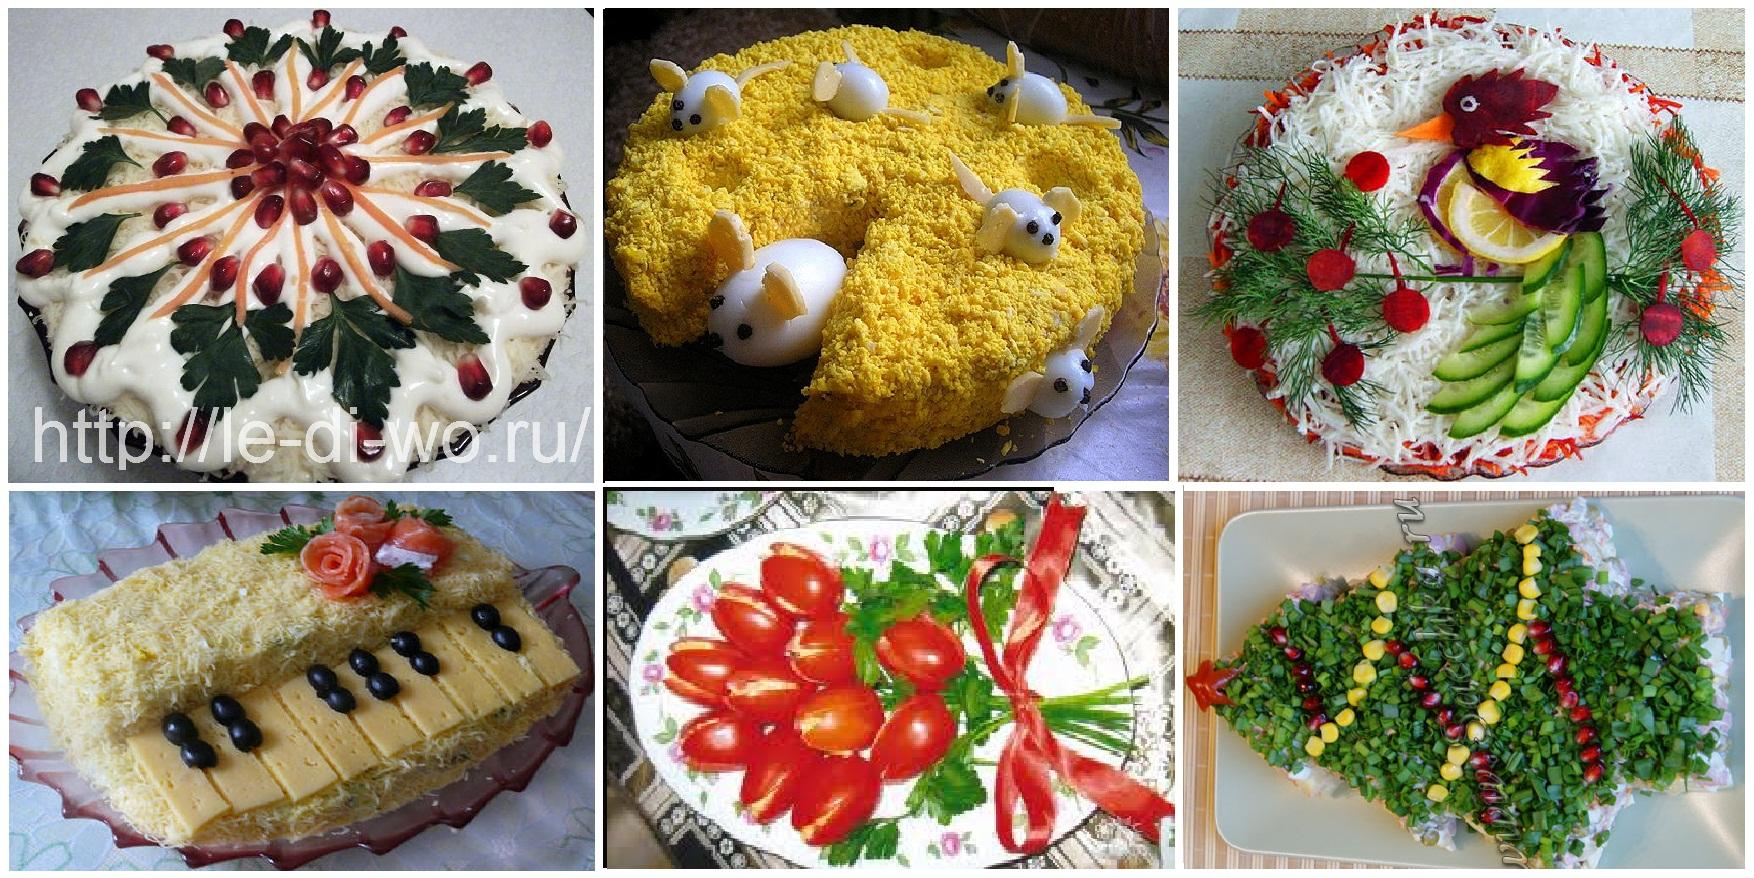 https://vrukodelii.com/attachments/2013/12/salat-vozdushn.jpg